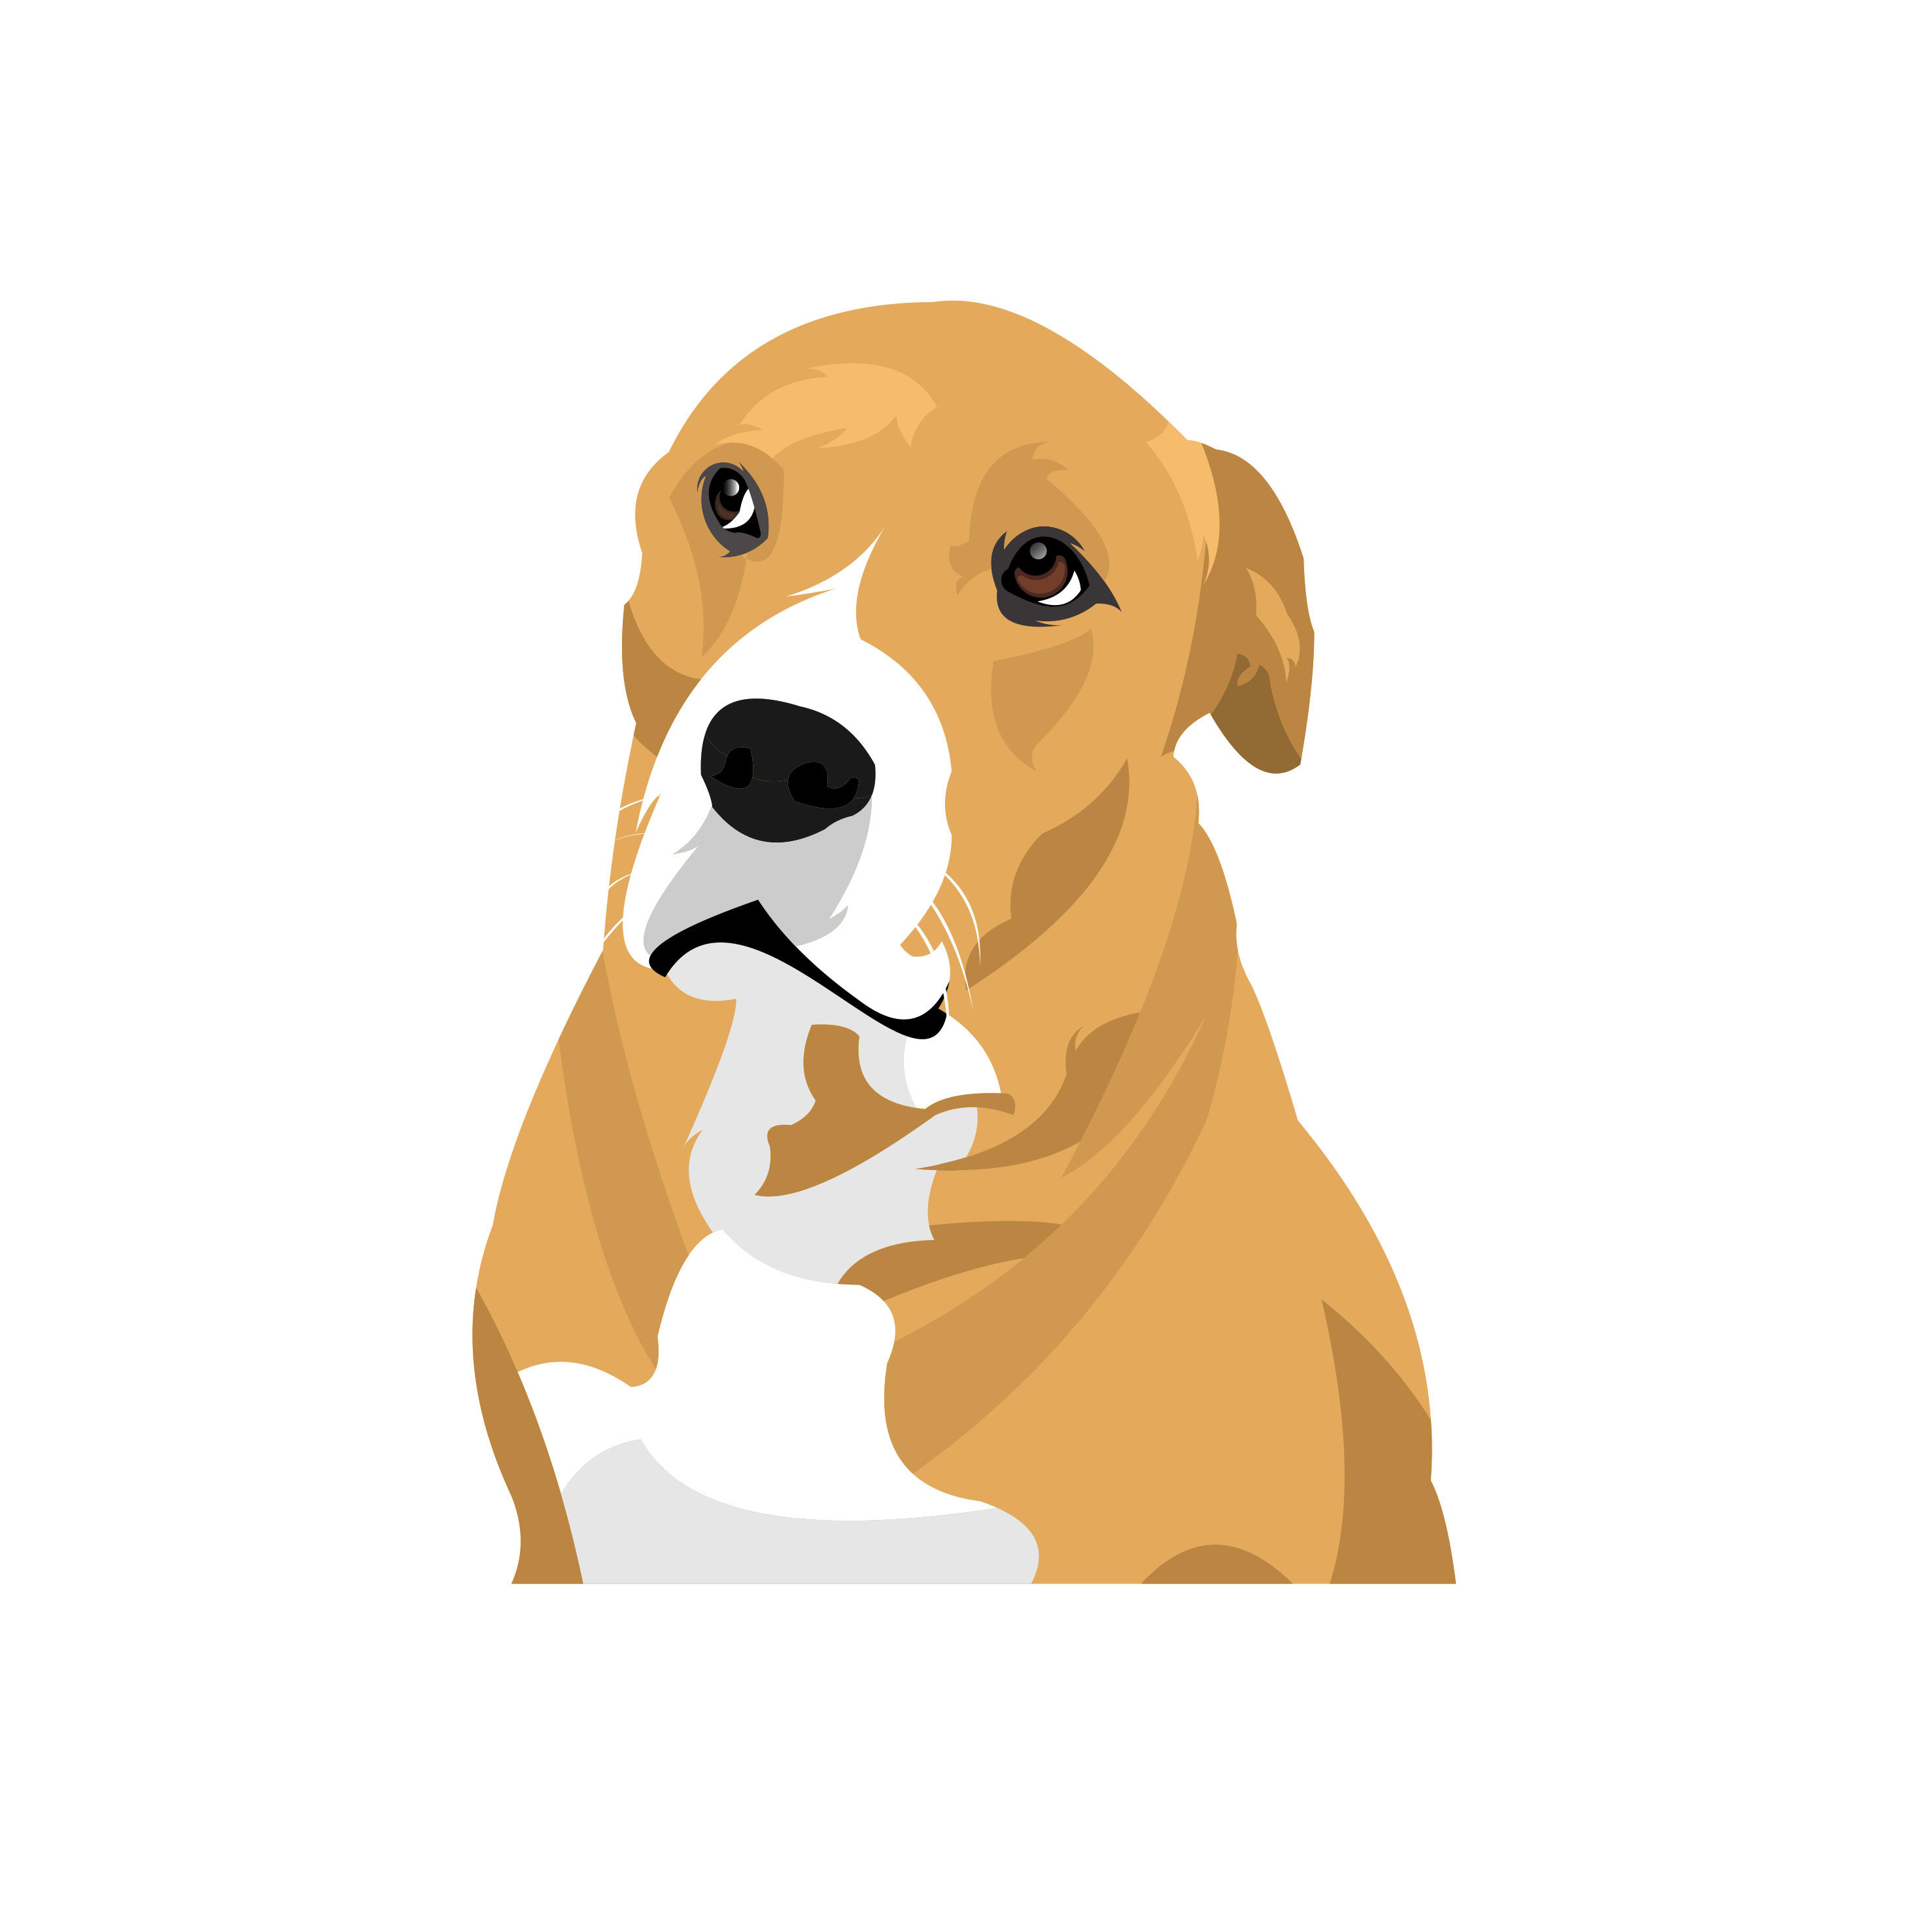 Make Vector Illustration Dog Cat Animal Pet Cartoon Portrait By Nirmalagraphics